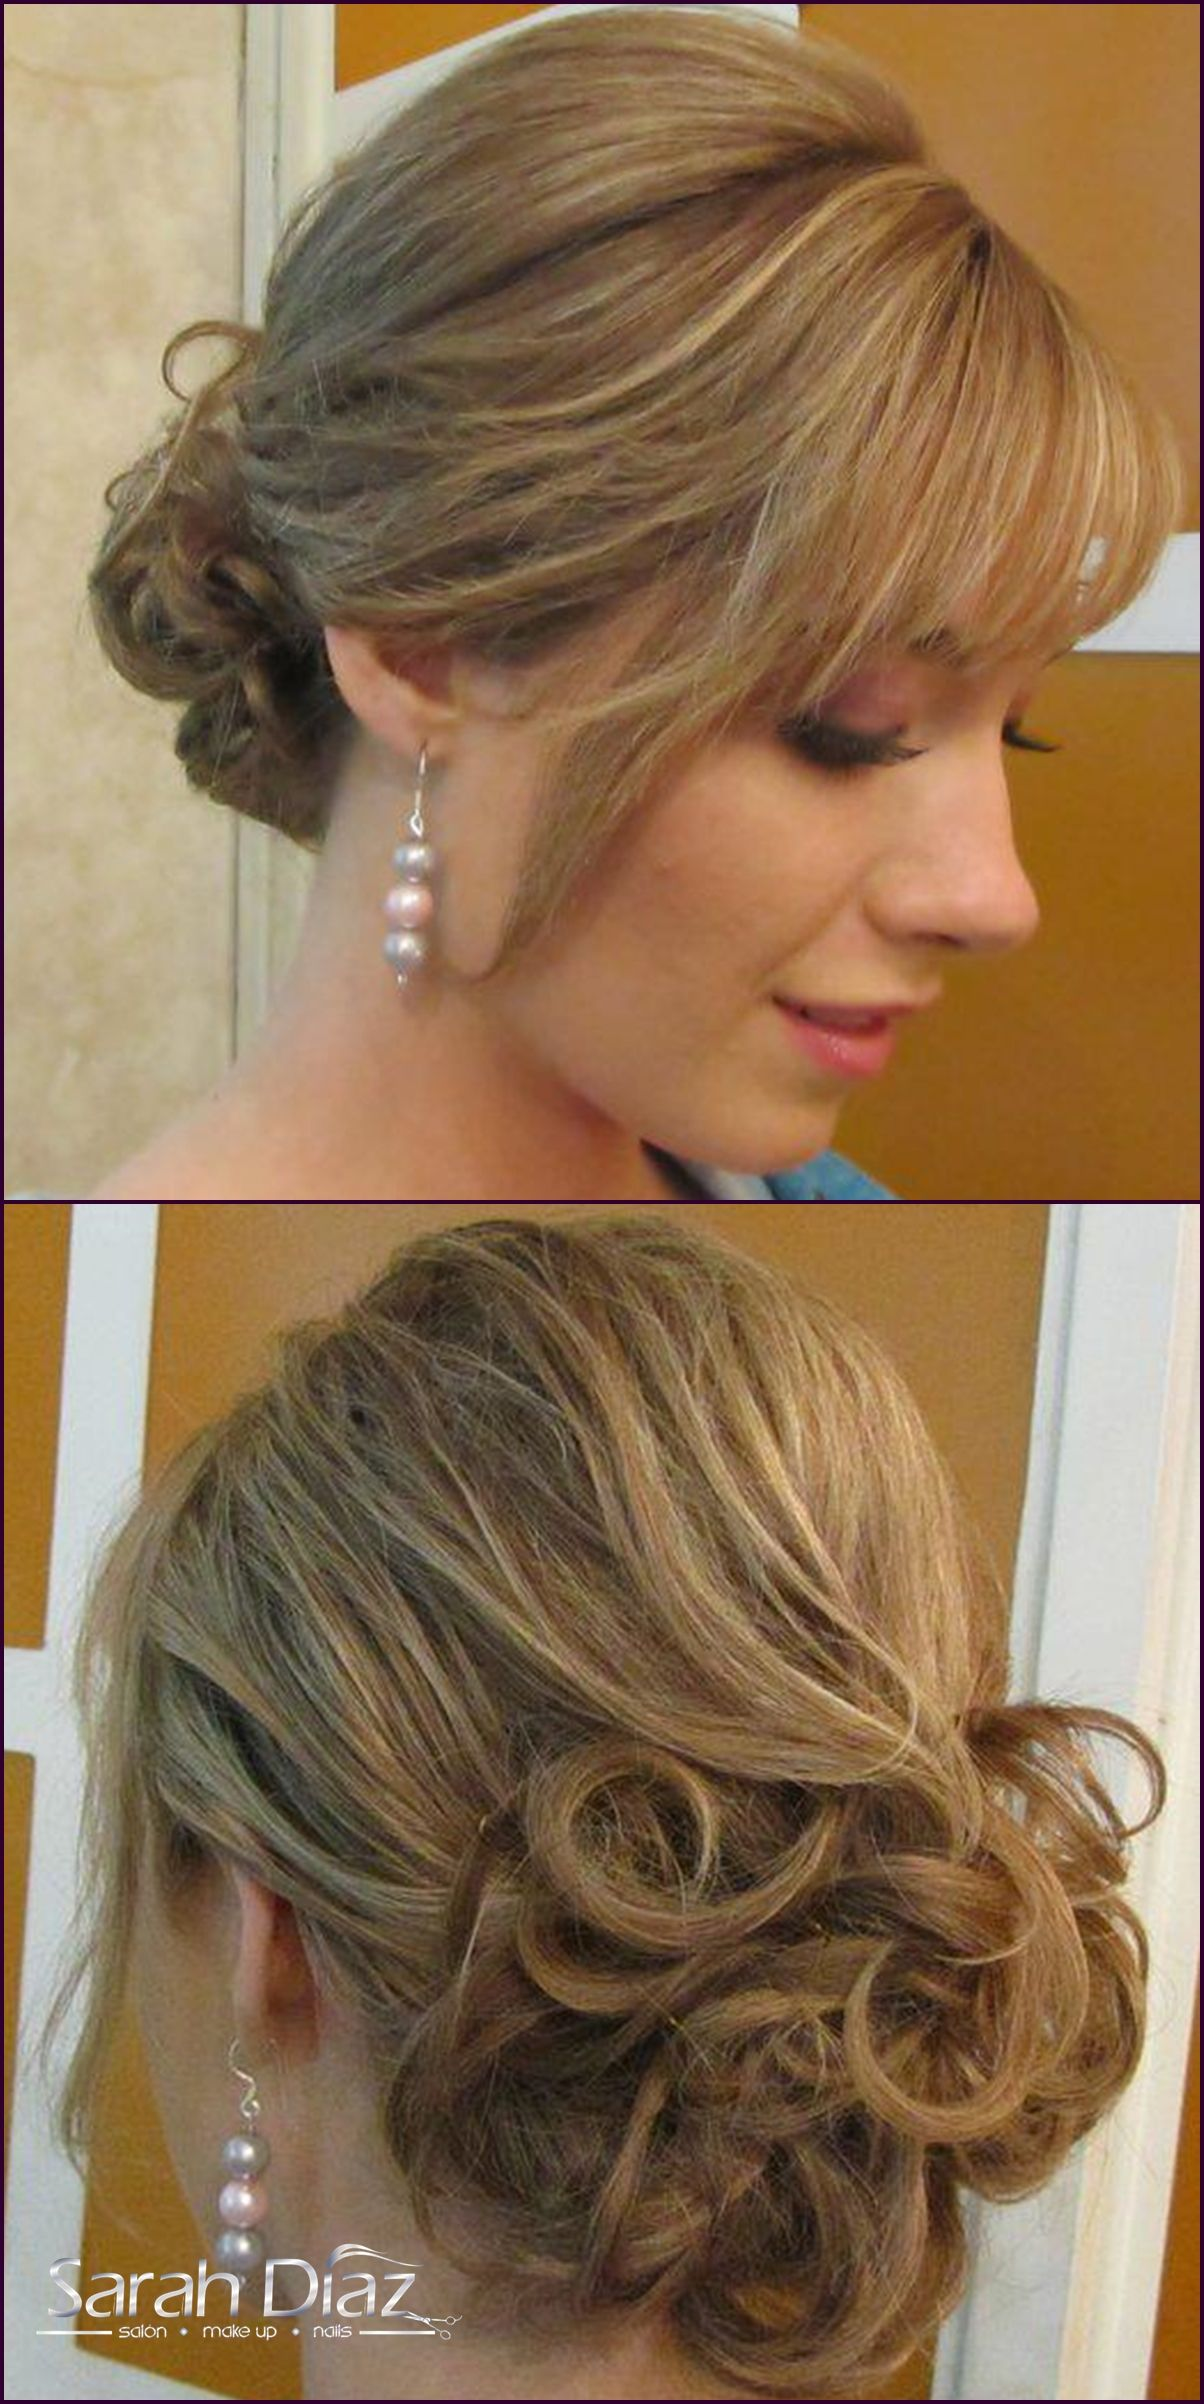 Chongo peinados de fiesta pinterest - Peinados de fiesta ...